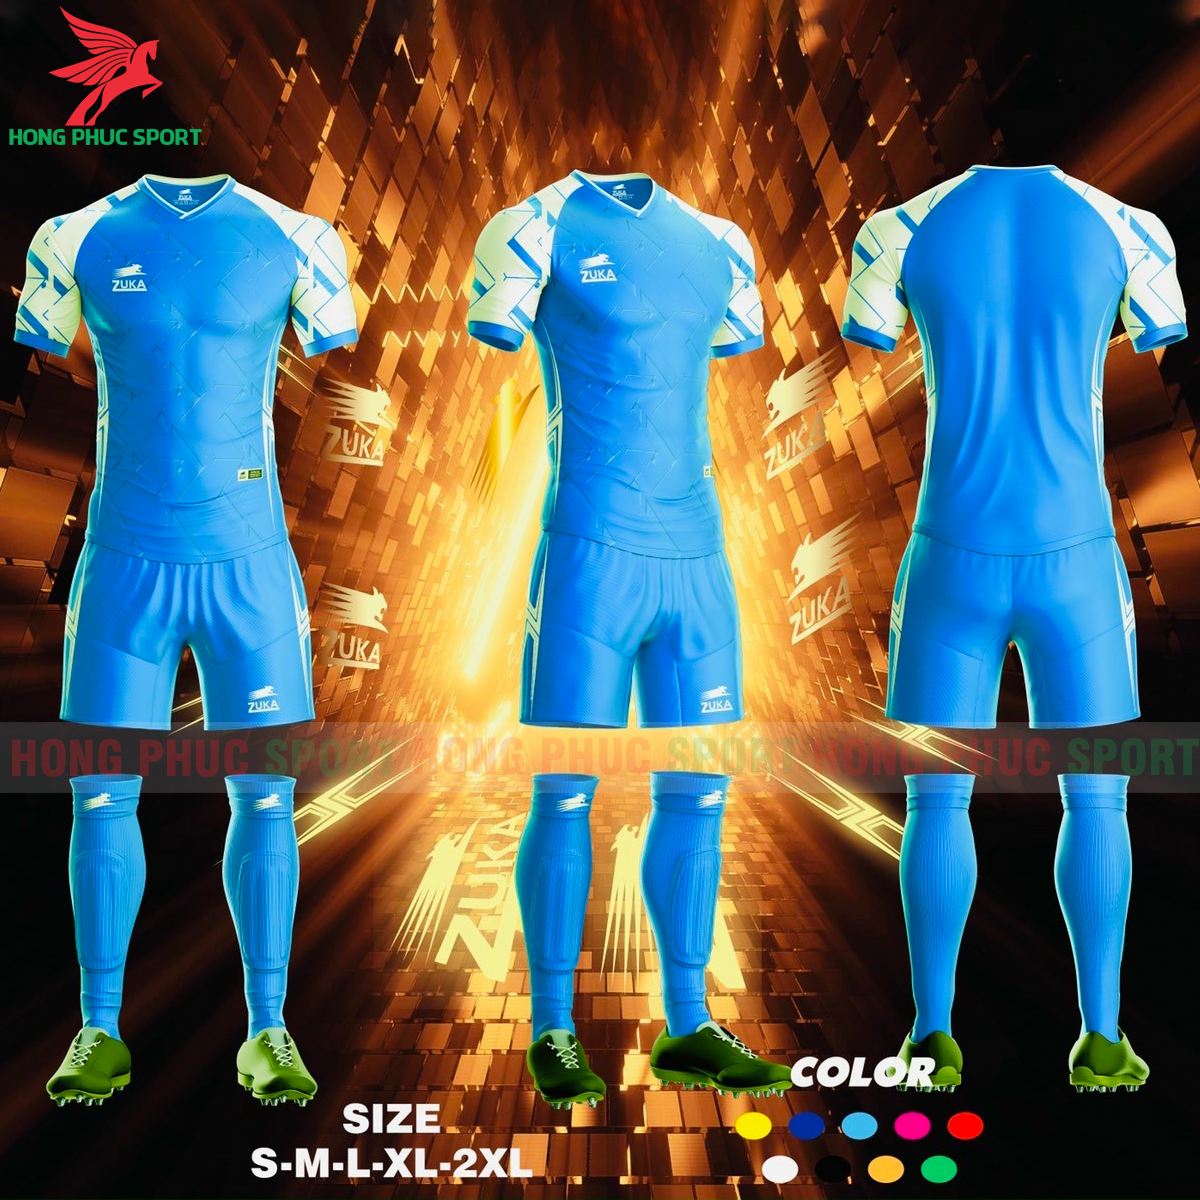 https://cdn.hongphucsport.com/unsafe/s4.shopbay.vn/files/285/ao-bong-da-khong-logo-zuka-spf01-mau-xanh-da-606be33cefbd2.png